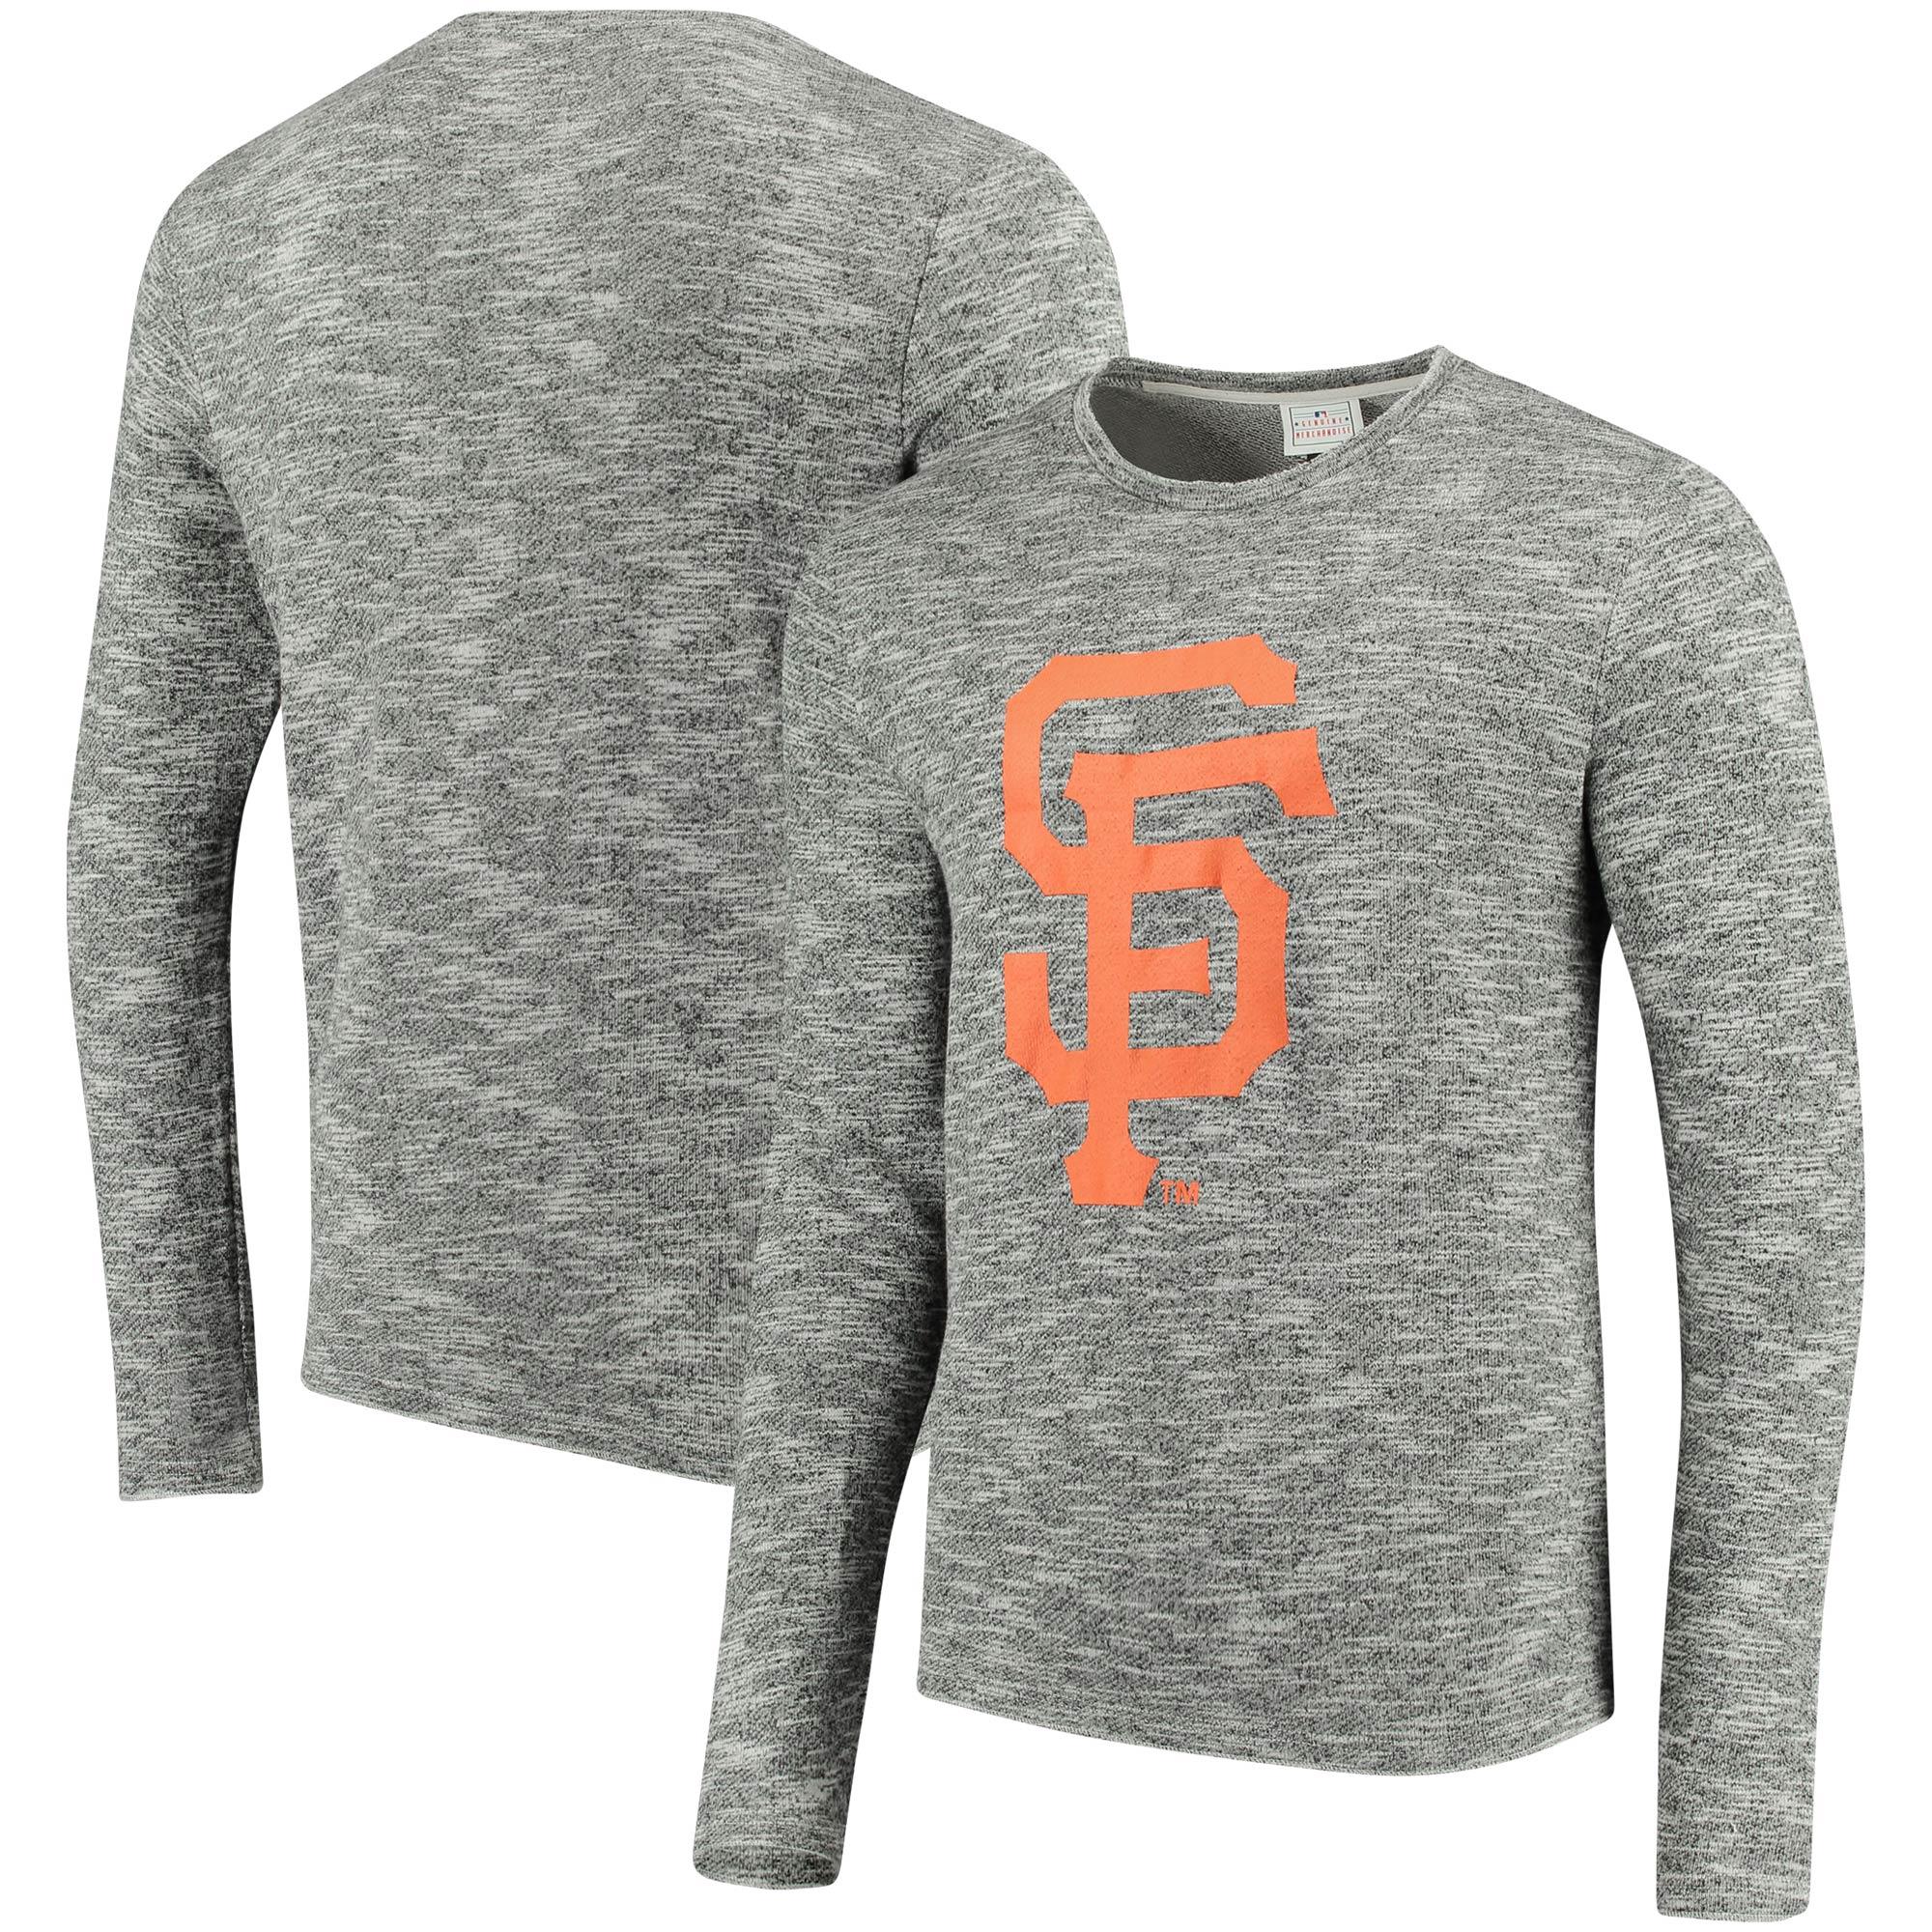 San Francisco Giants Heathered Crew Neck Sweater - Heathered Black